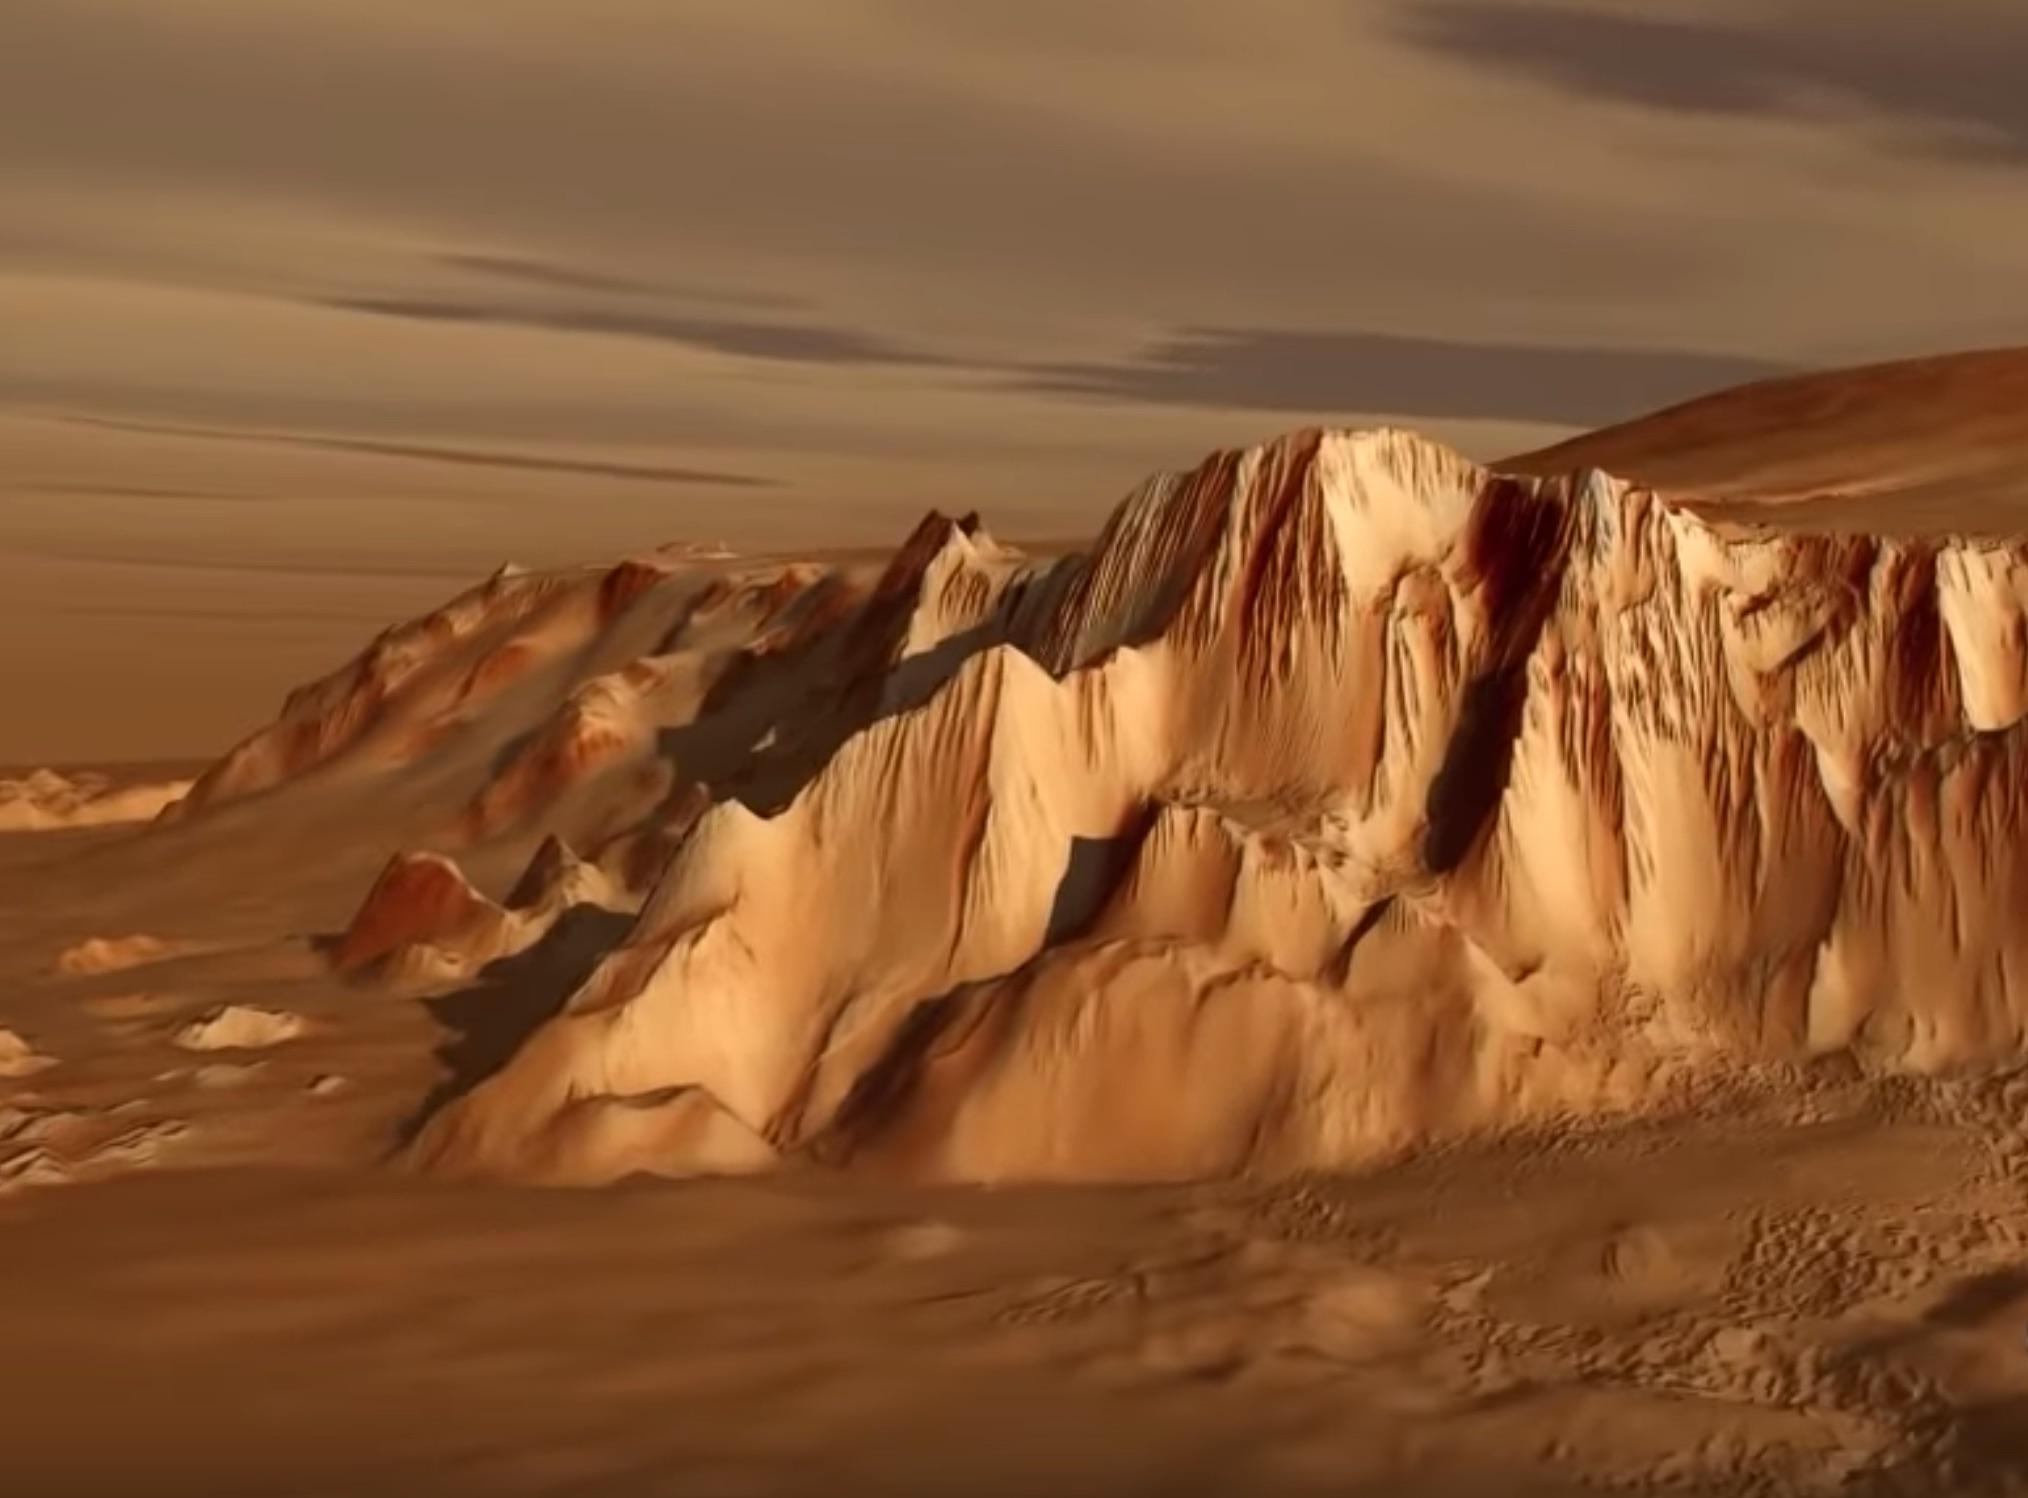 mars-olympus-mons-volcano